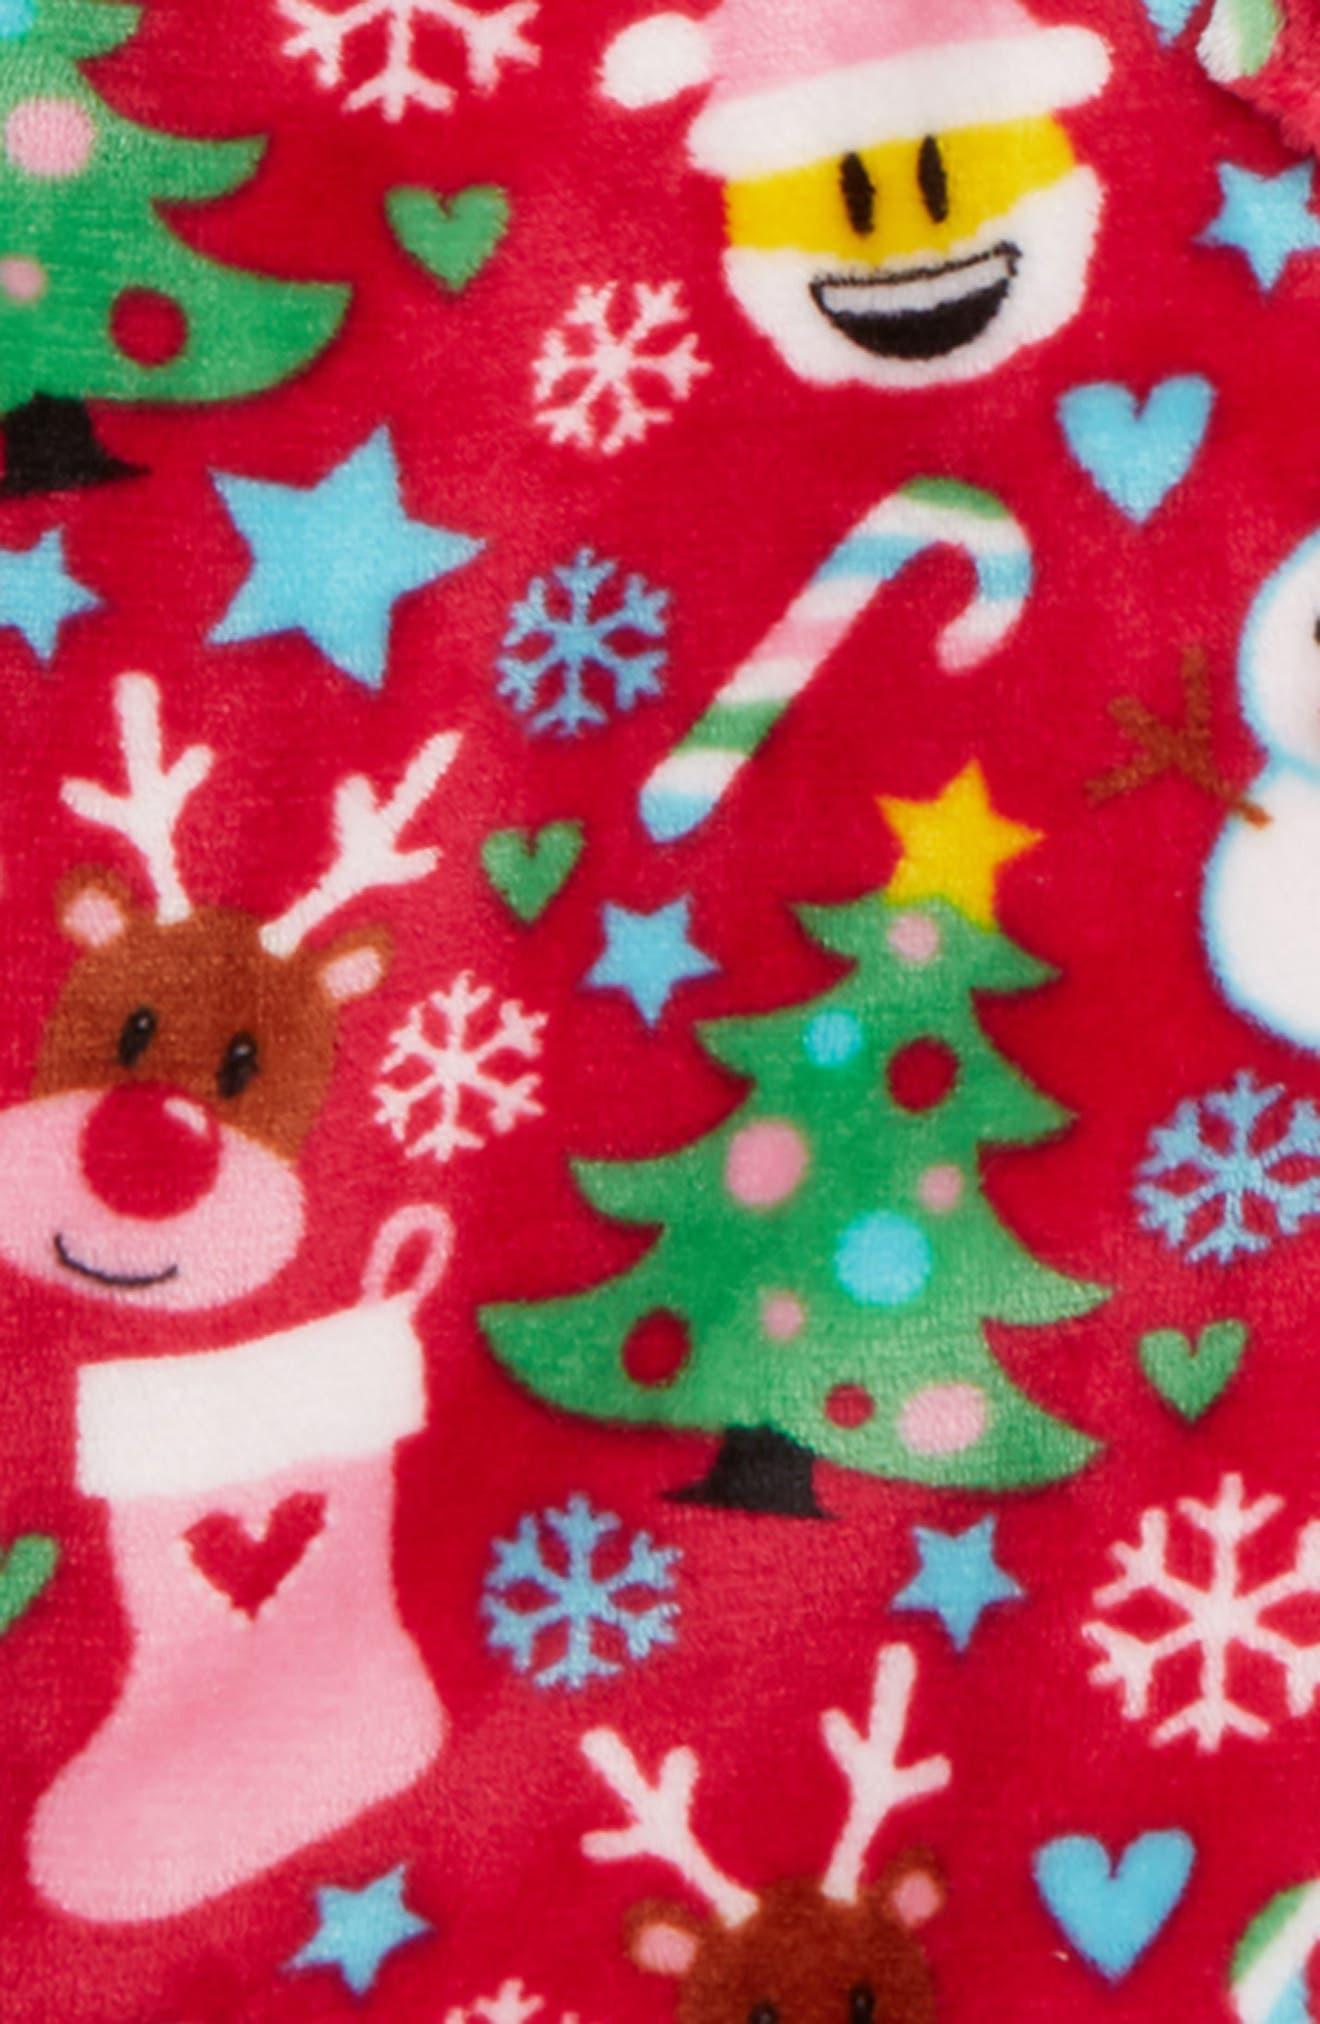 Holiday Fleece Robe,                             Alternate thumbnail 2, color,                             600